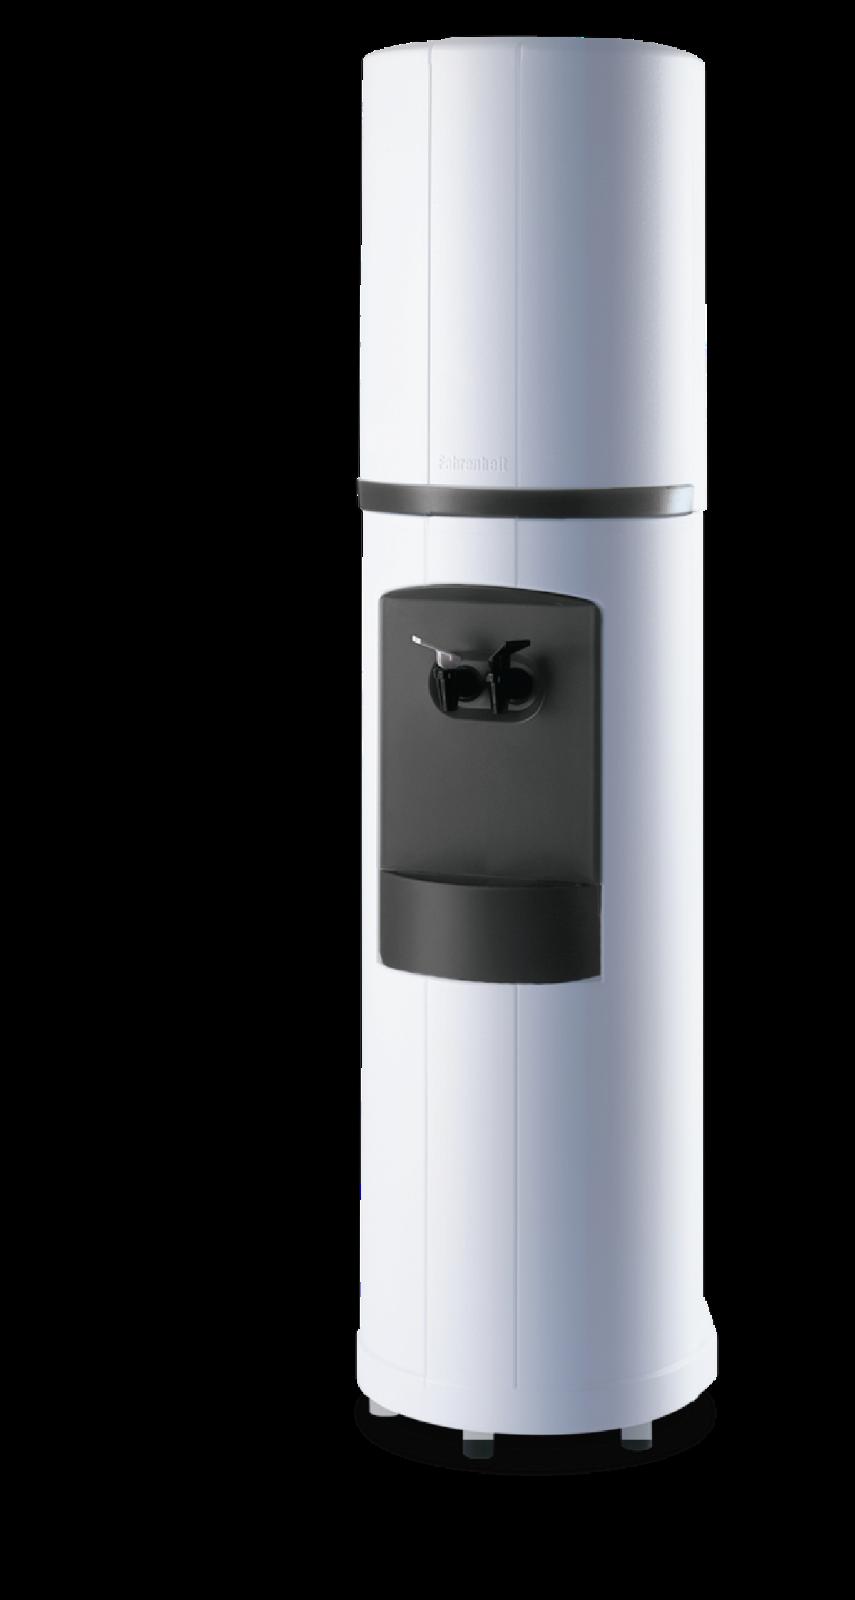 Aquaverve Fahrenheit Bottleless Water Cooler With Filtration